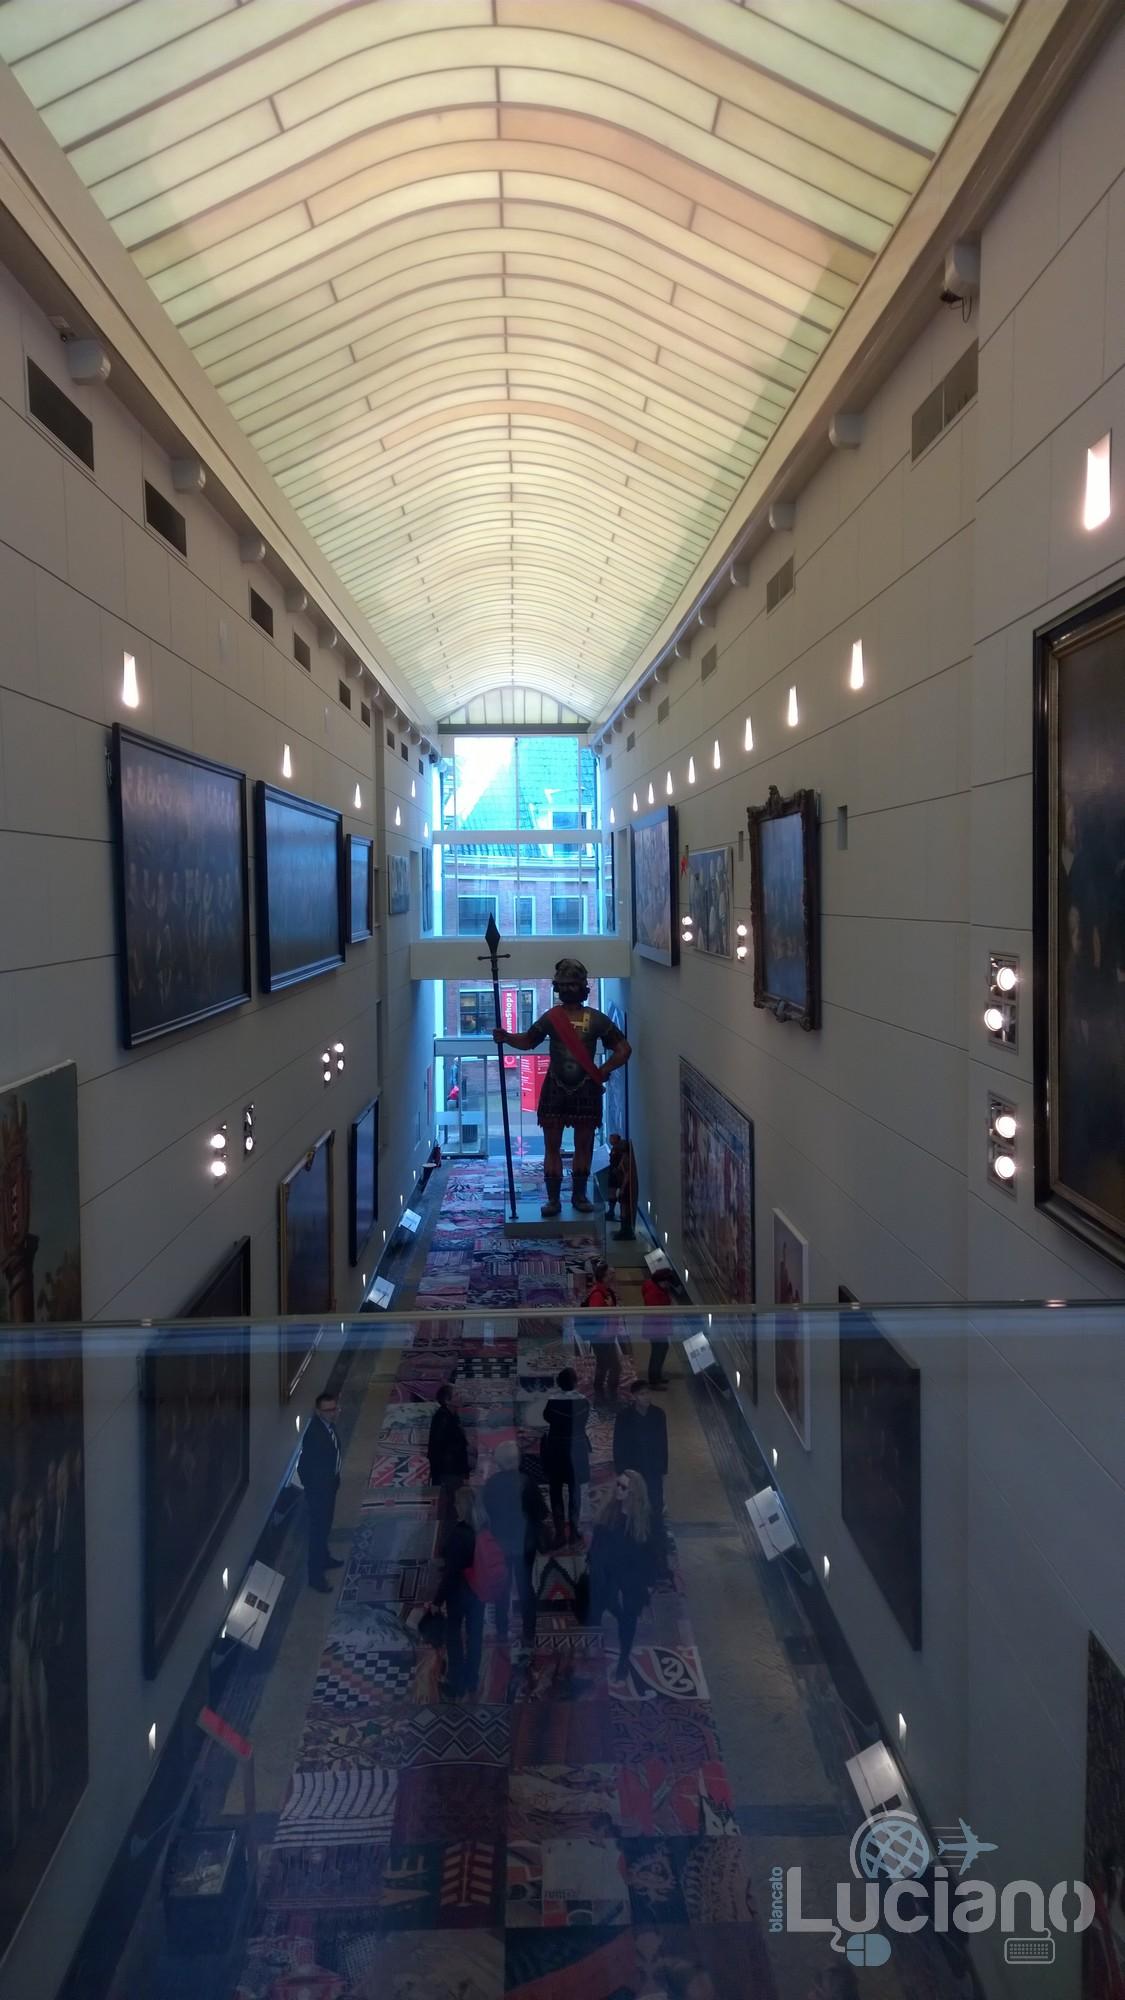 amsterdam-2014-vueling-lucianoblancatoit (90)